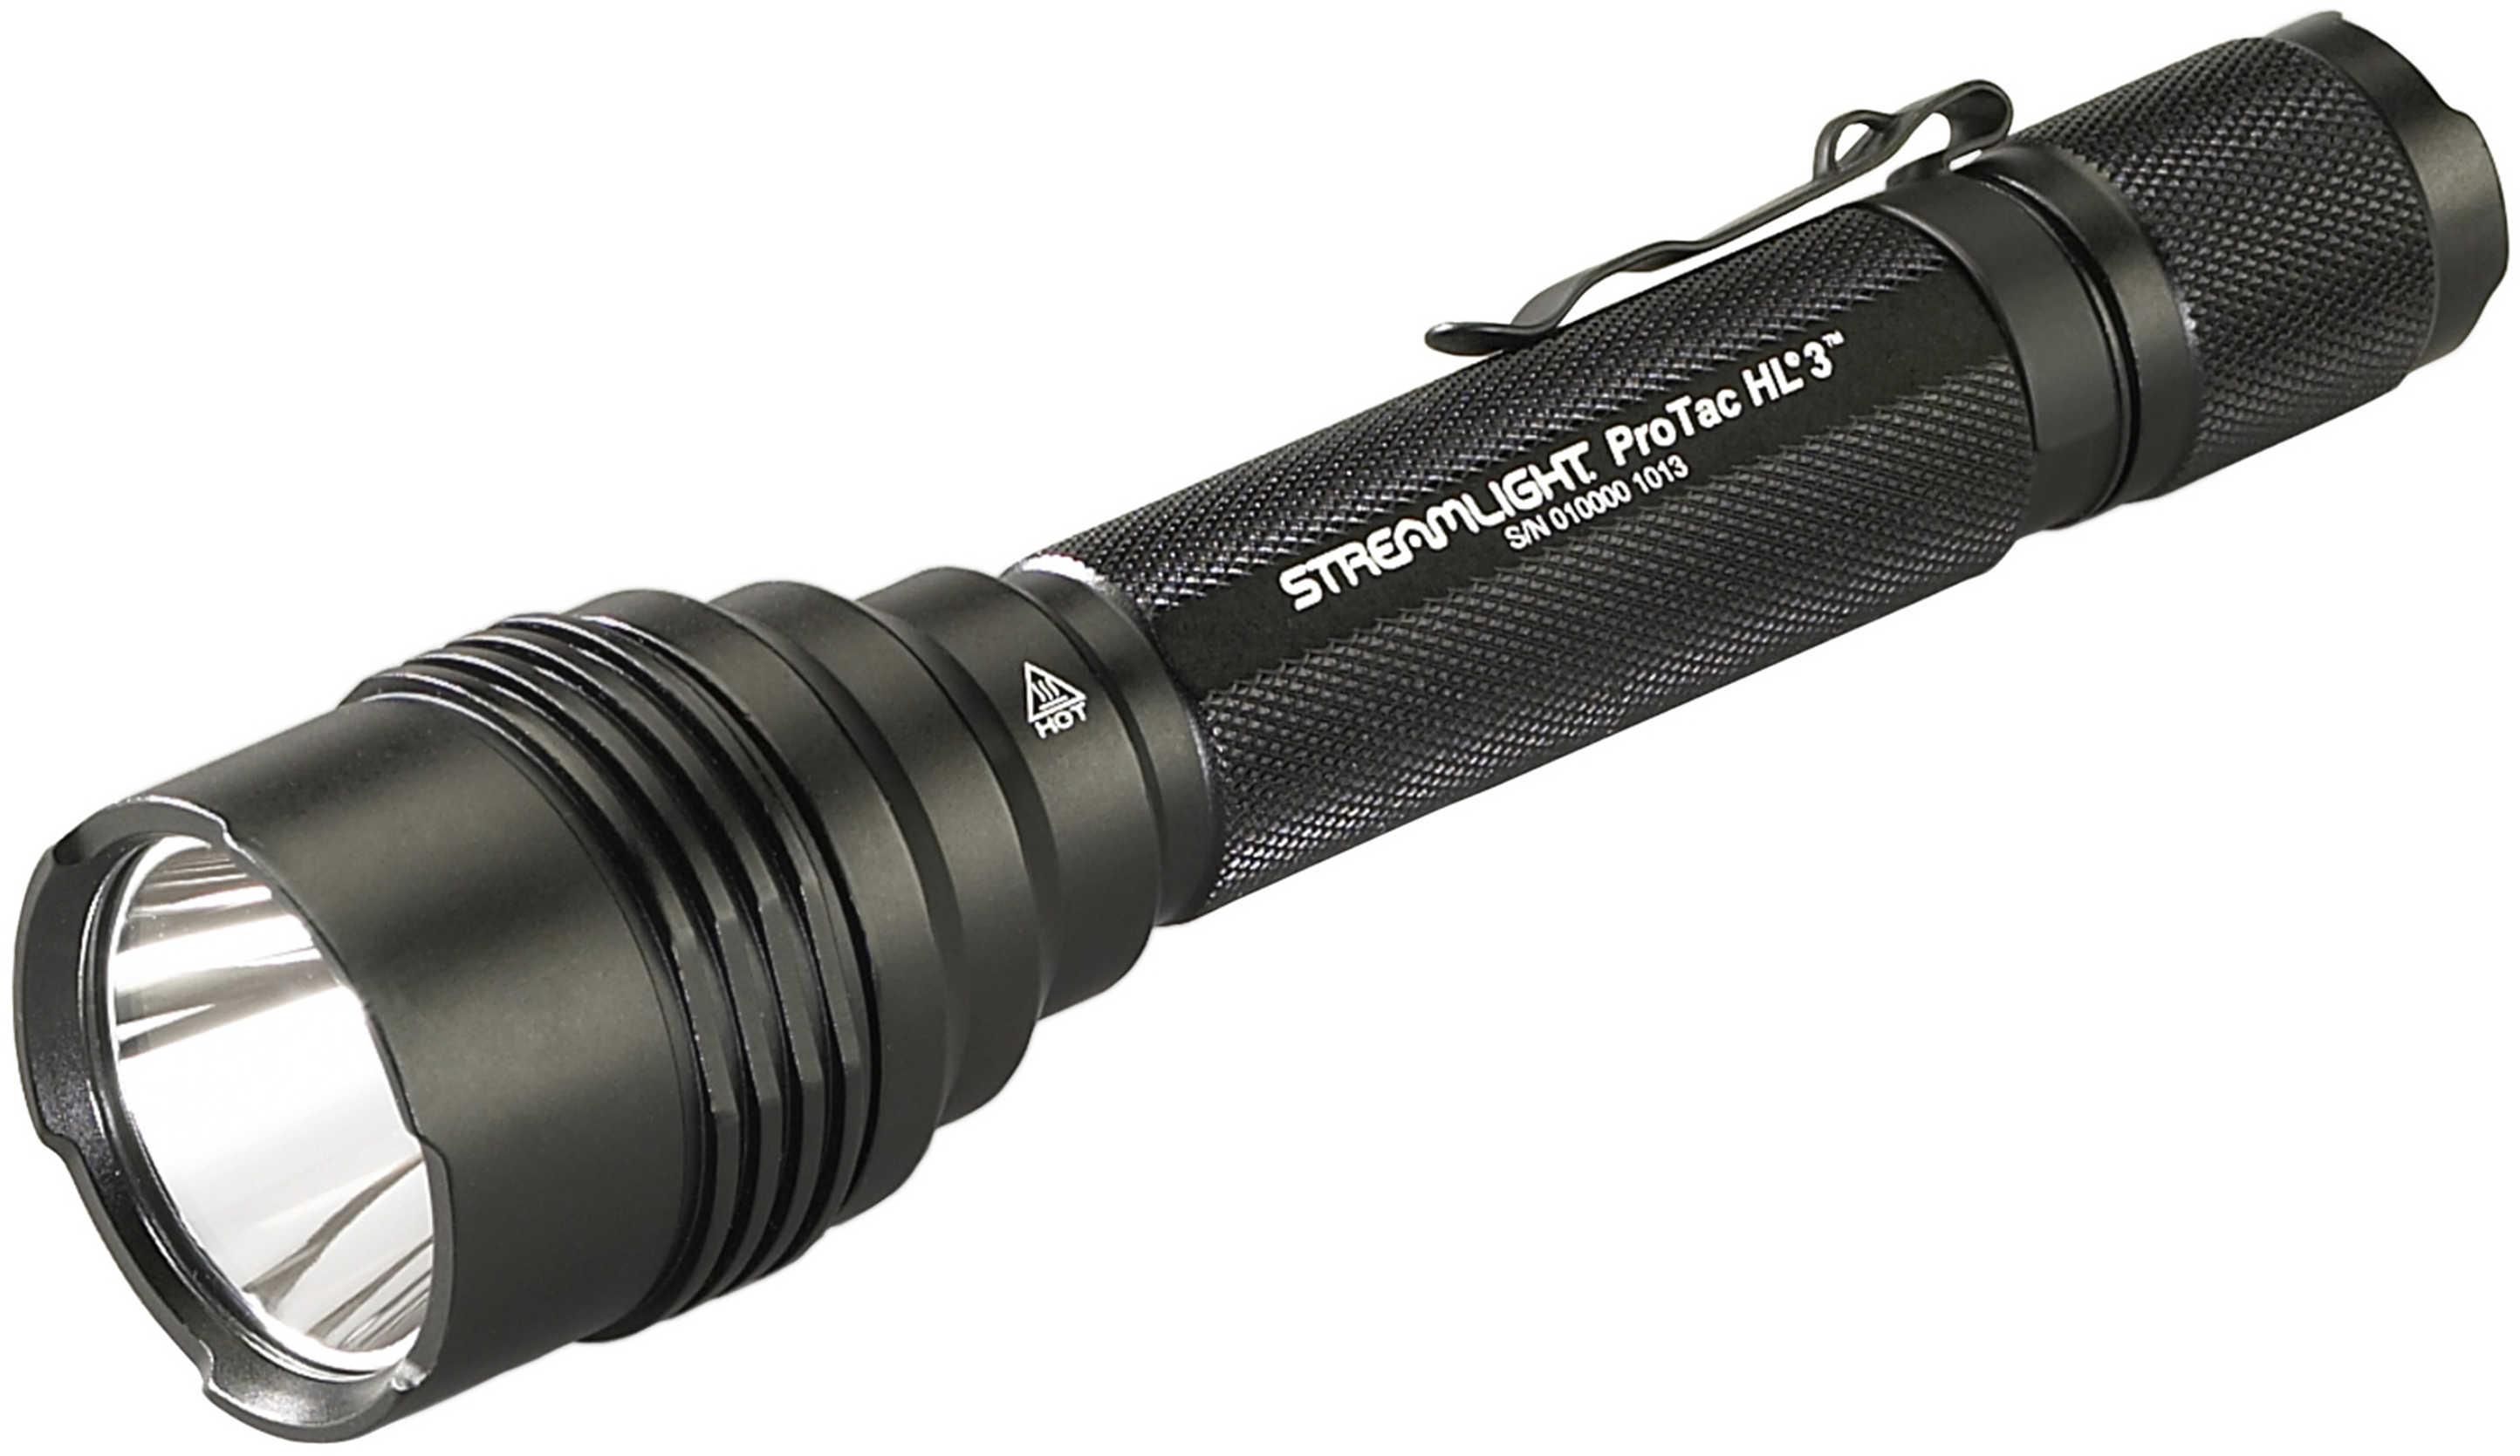 Streamlight HL 3 Pro-Tac Flashlight C4 LED 1 100 Lumens Includes 3 Lithium Batteries Nylon Holster Black Finish 88047